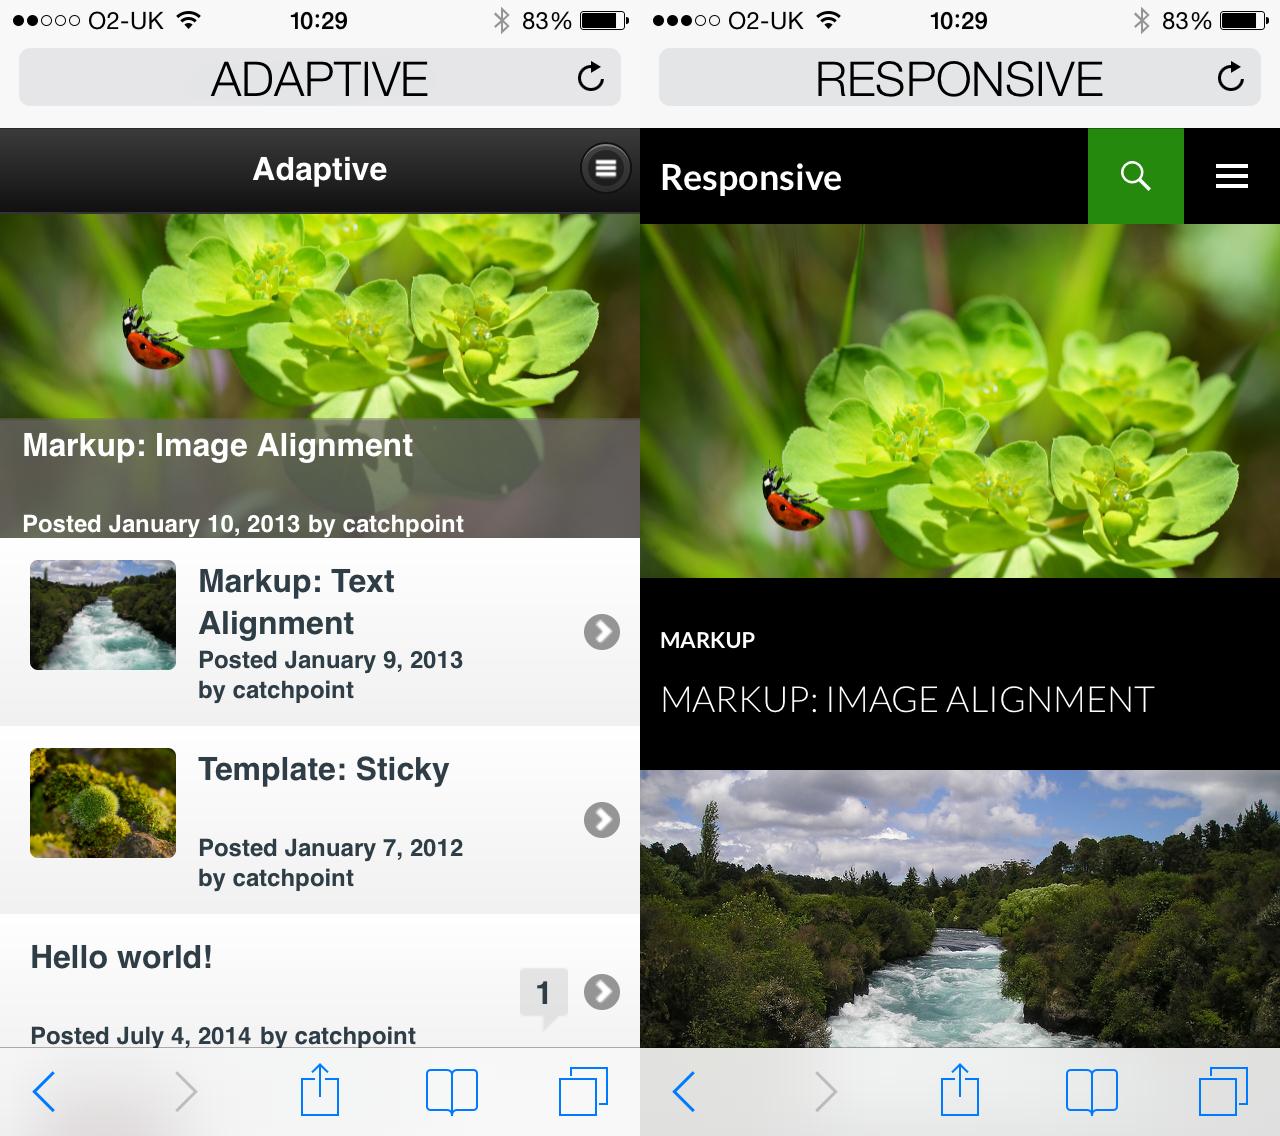 Adaptive Responsive on mobile